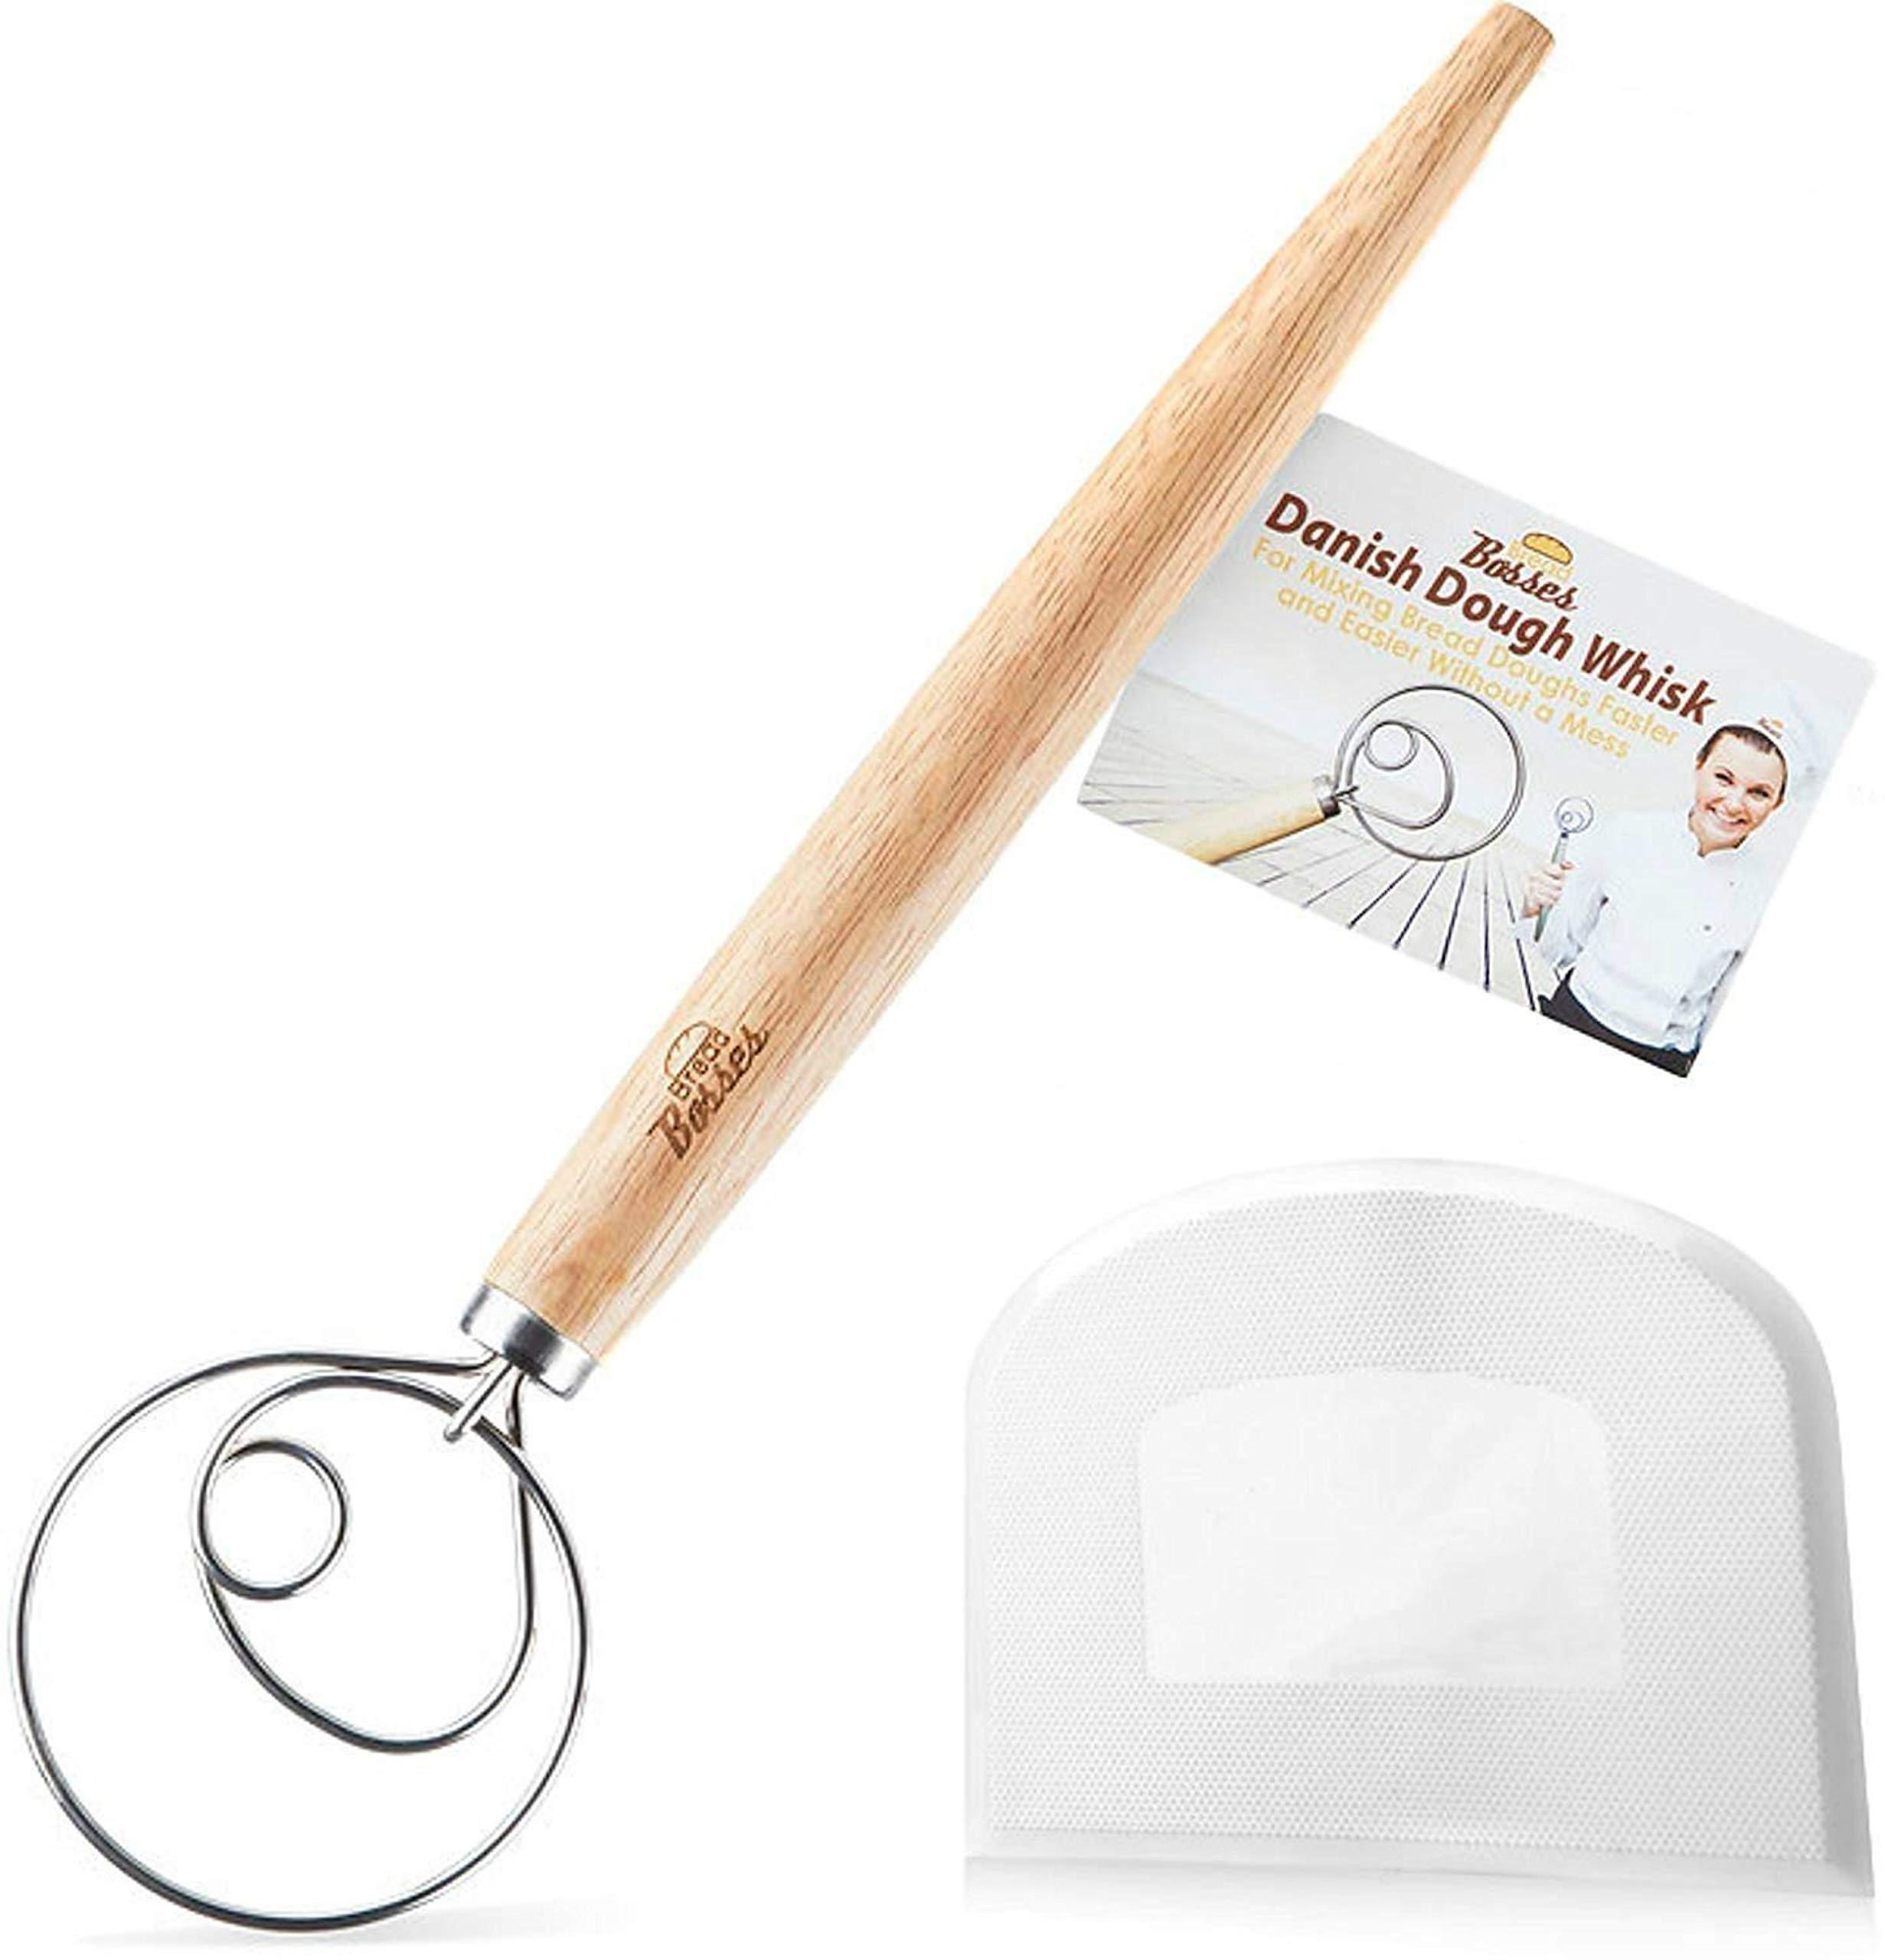 Danish Dough Whisk Bread Mixer - Hook Dutch Pizza Dough Making Bread Mixer Whisk Hooks Accessories Wisks - Great As A Gift